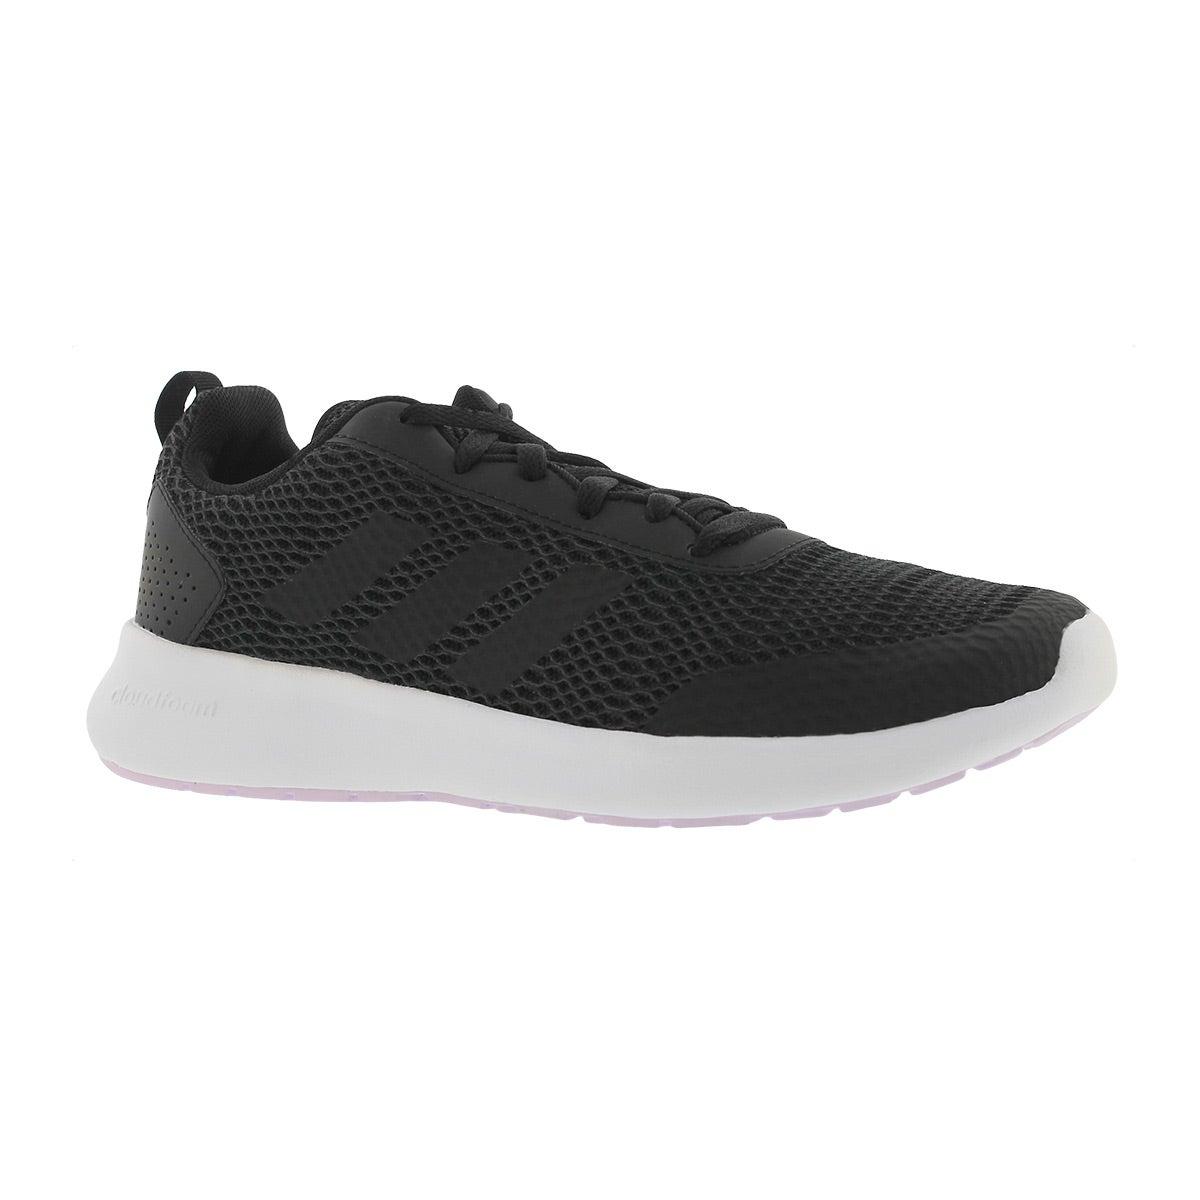 Women's CF ELEMENT RACE black/white running shoes